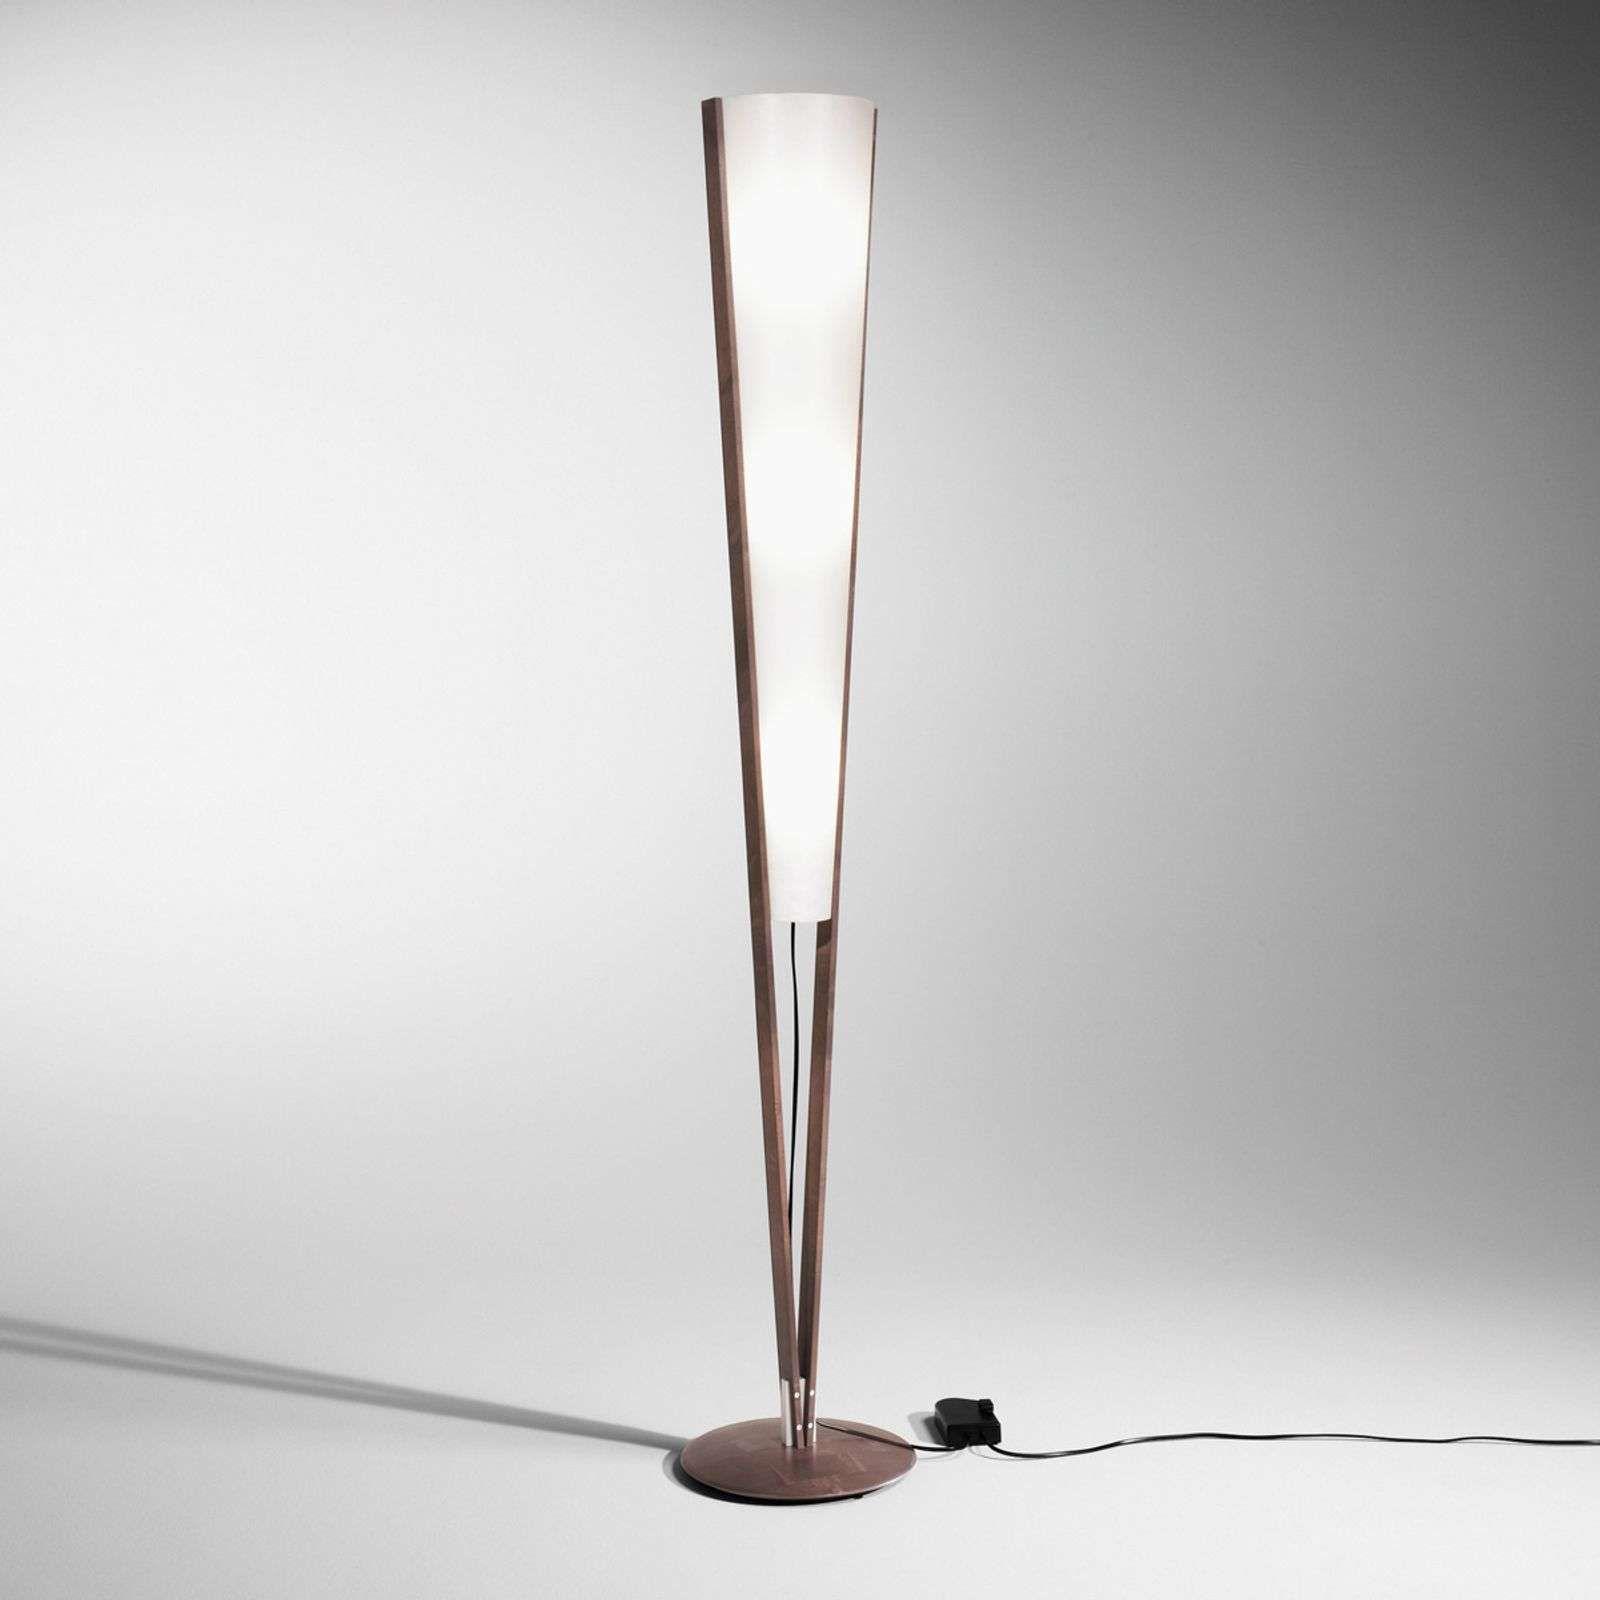 Vloerlamp Seba Met Voetdimmer Kastanjeolie Vloerlamp Lampen Lampen Zuiver